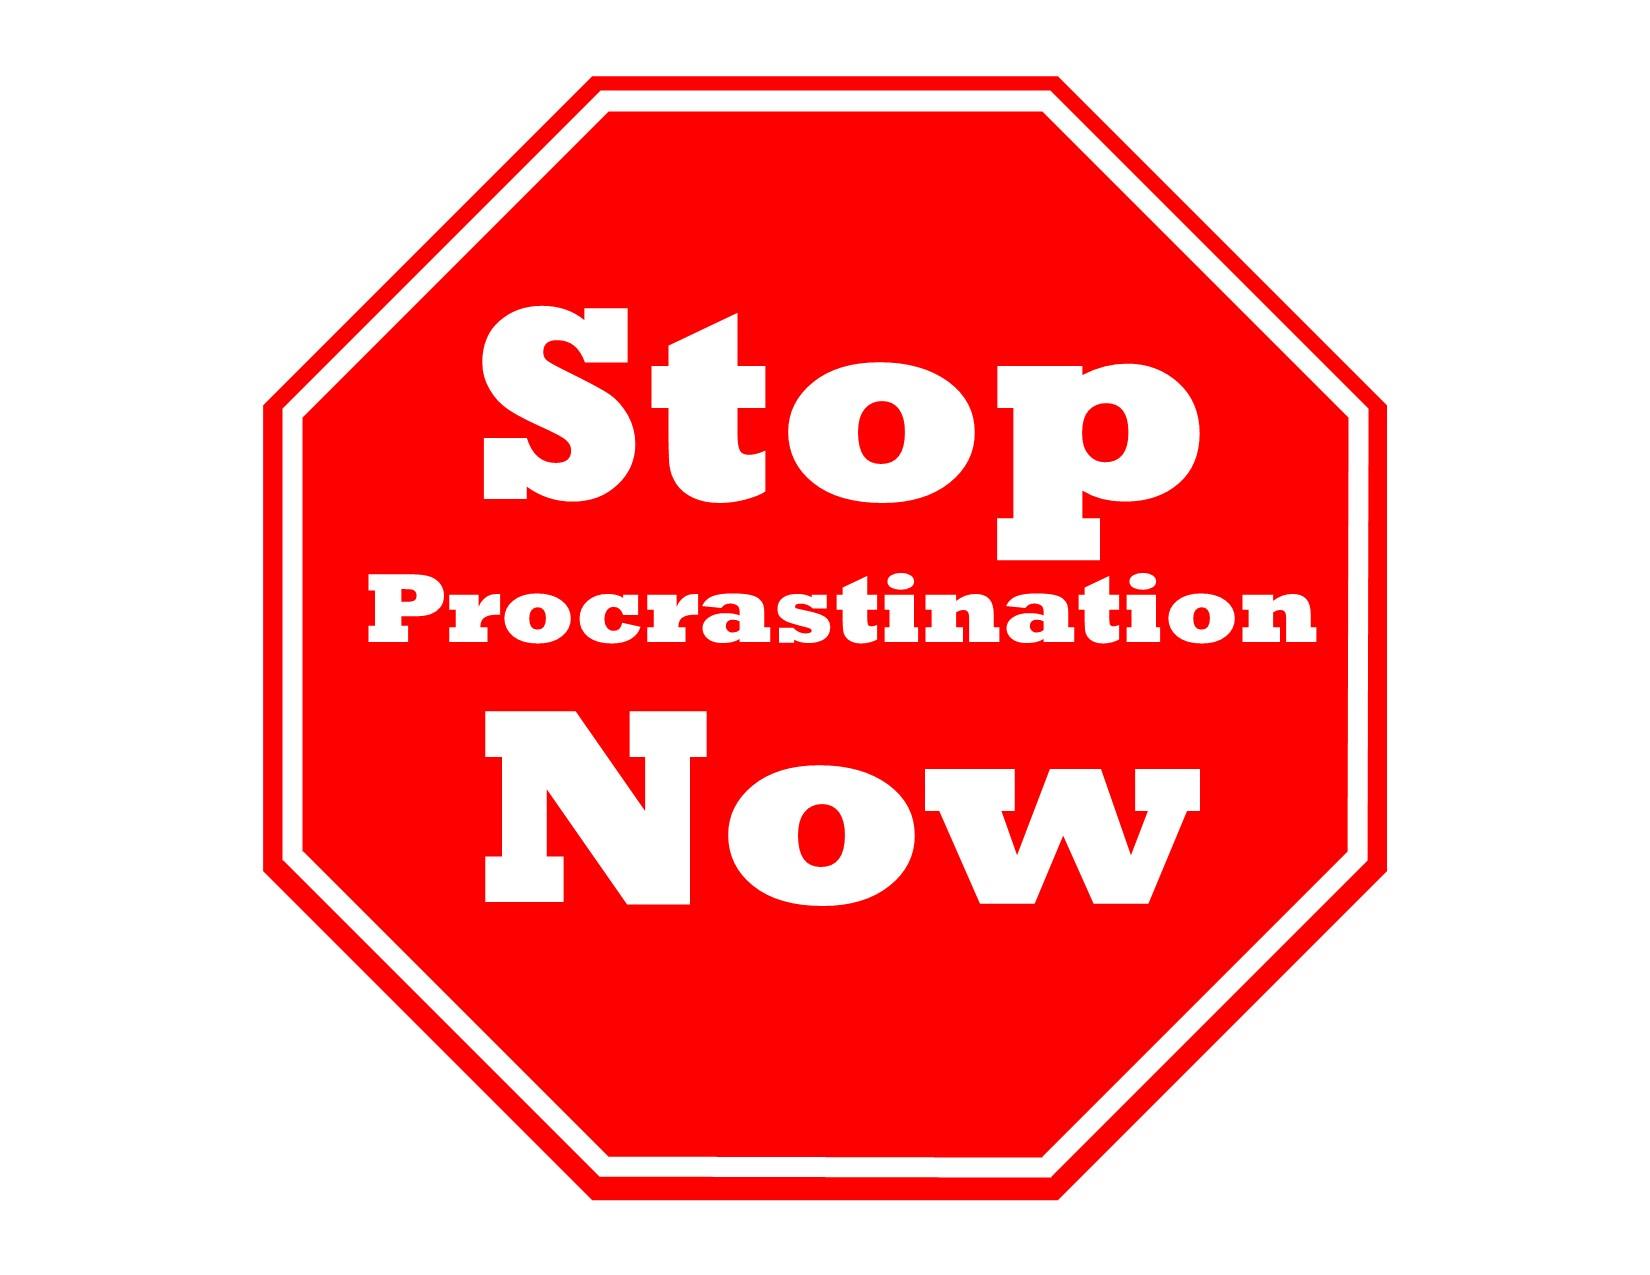 procrastination_stop